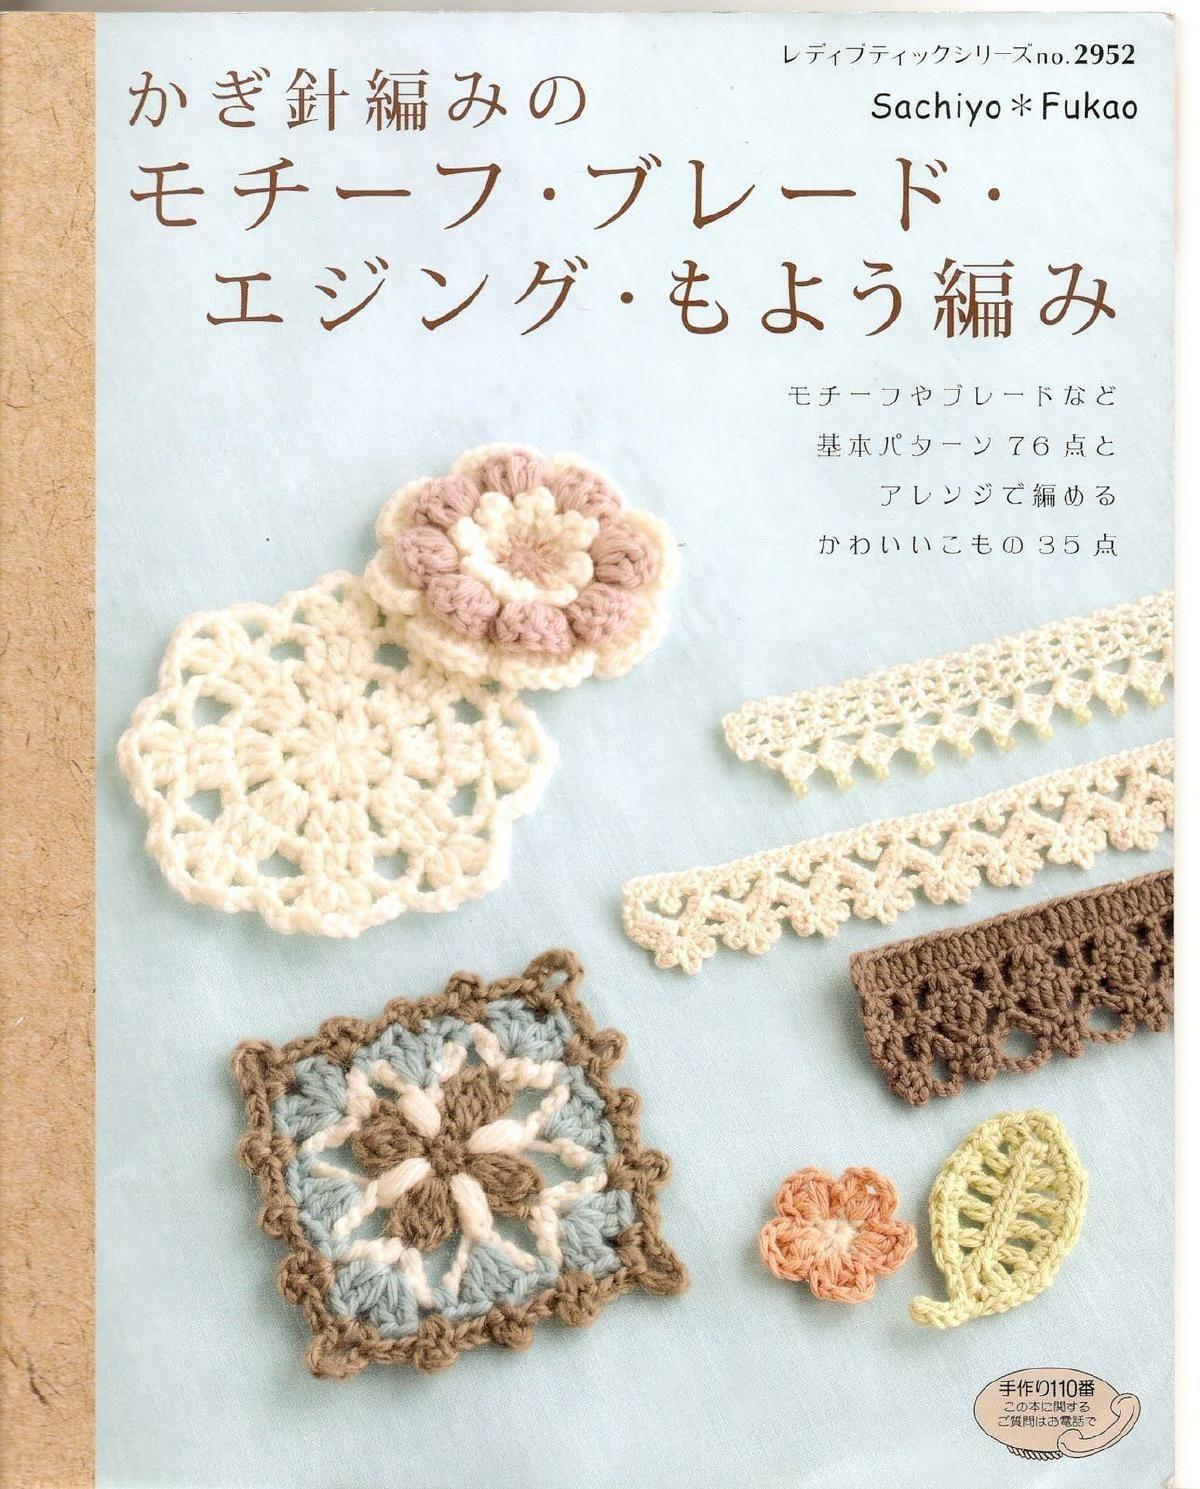 Again, beautiful crochet motifs, doilies, edgings and more ...